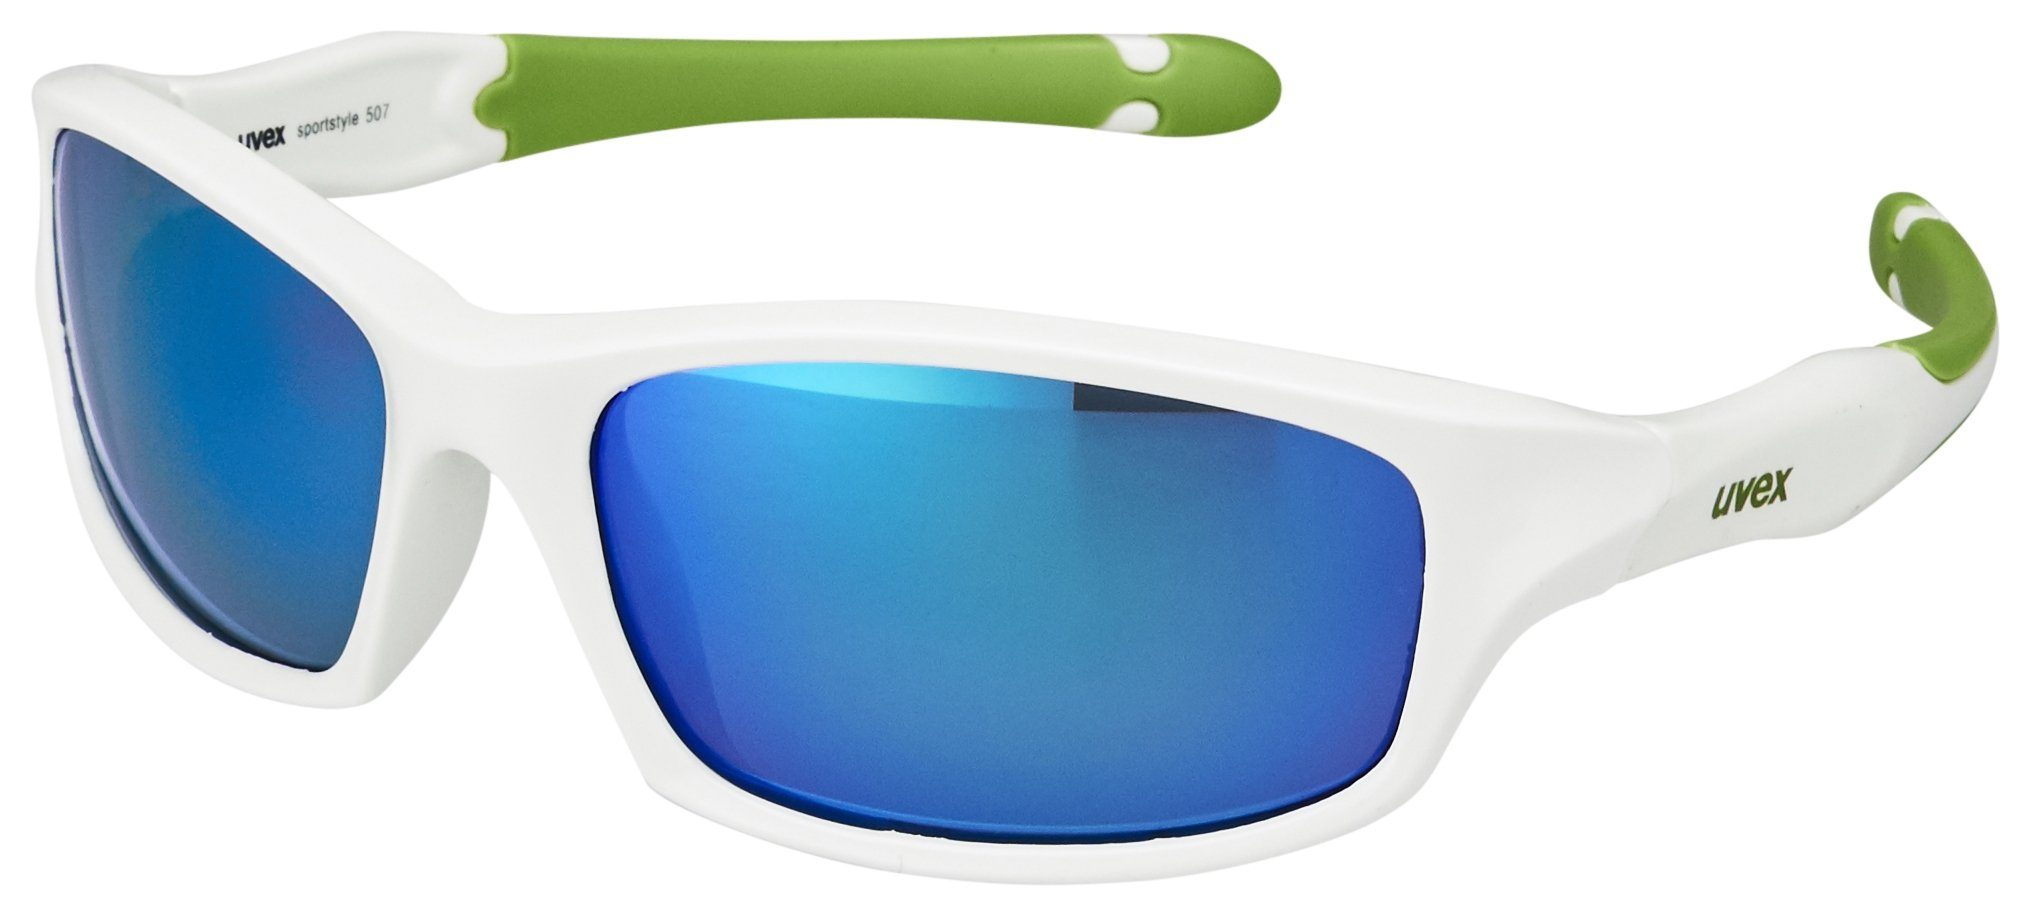 Uvex Radsportbrille »UVEX sportstyle 507 Kids Glasses«